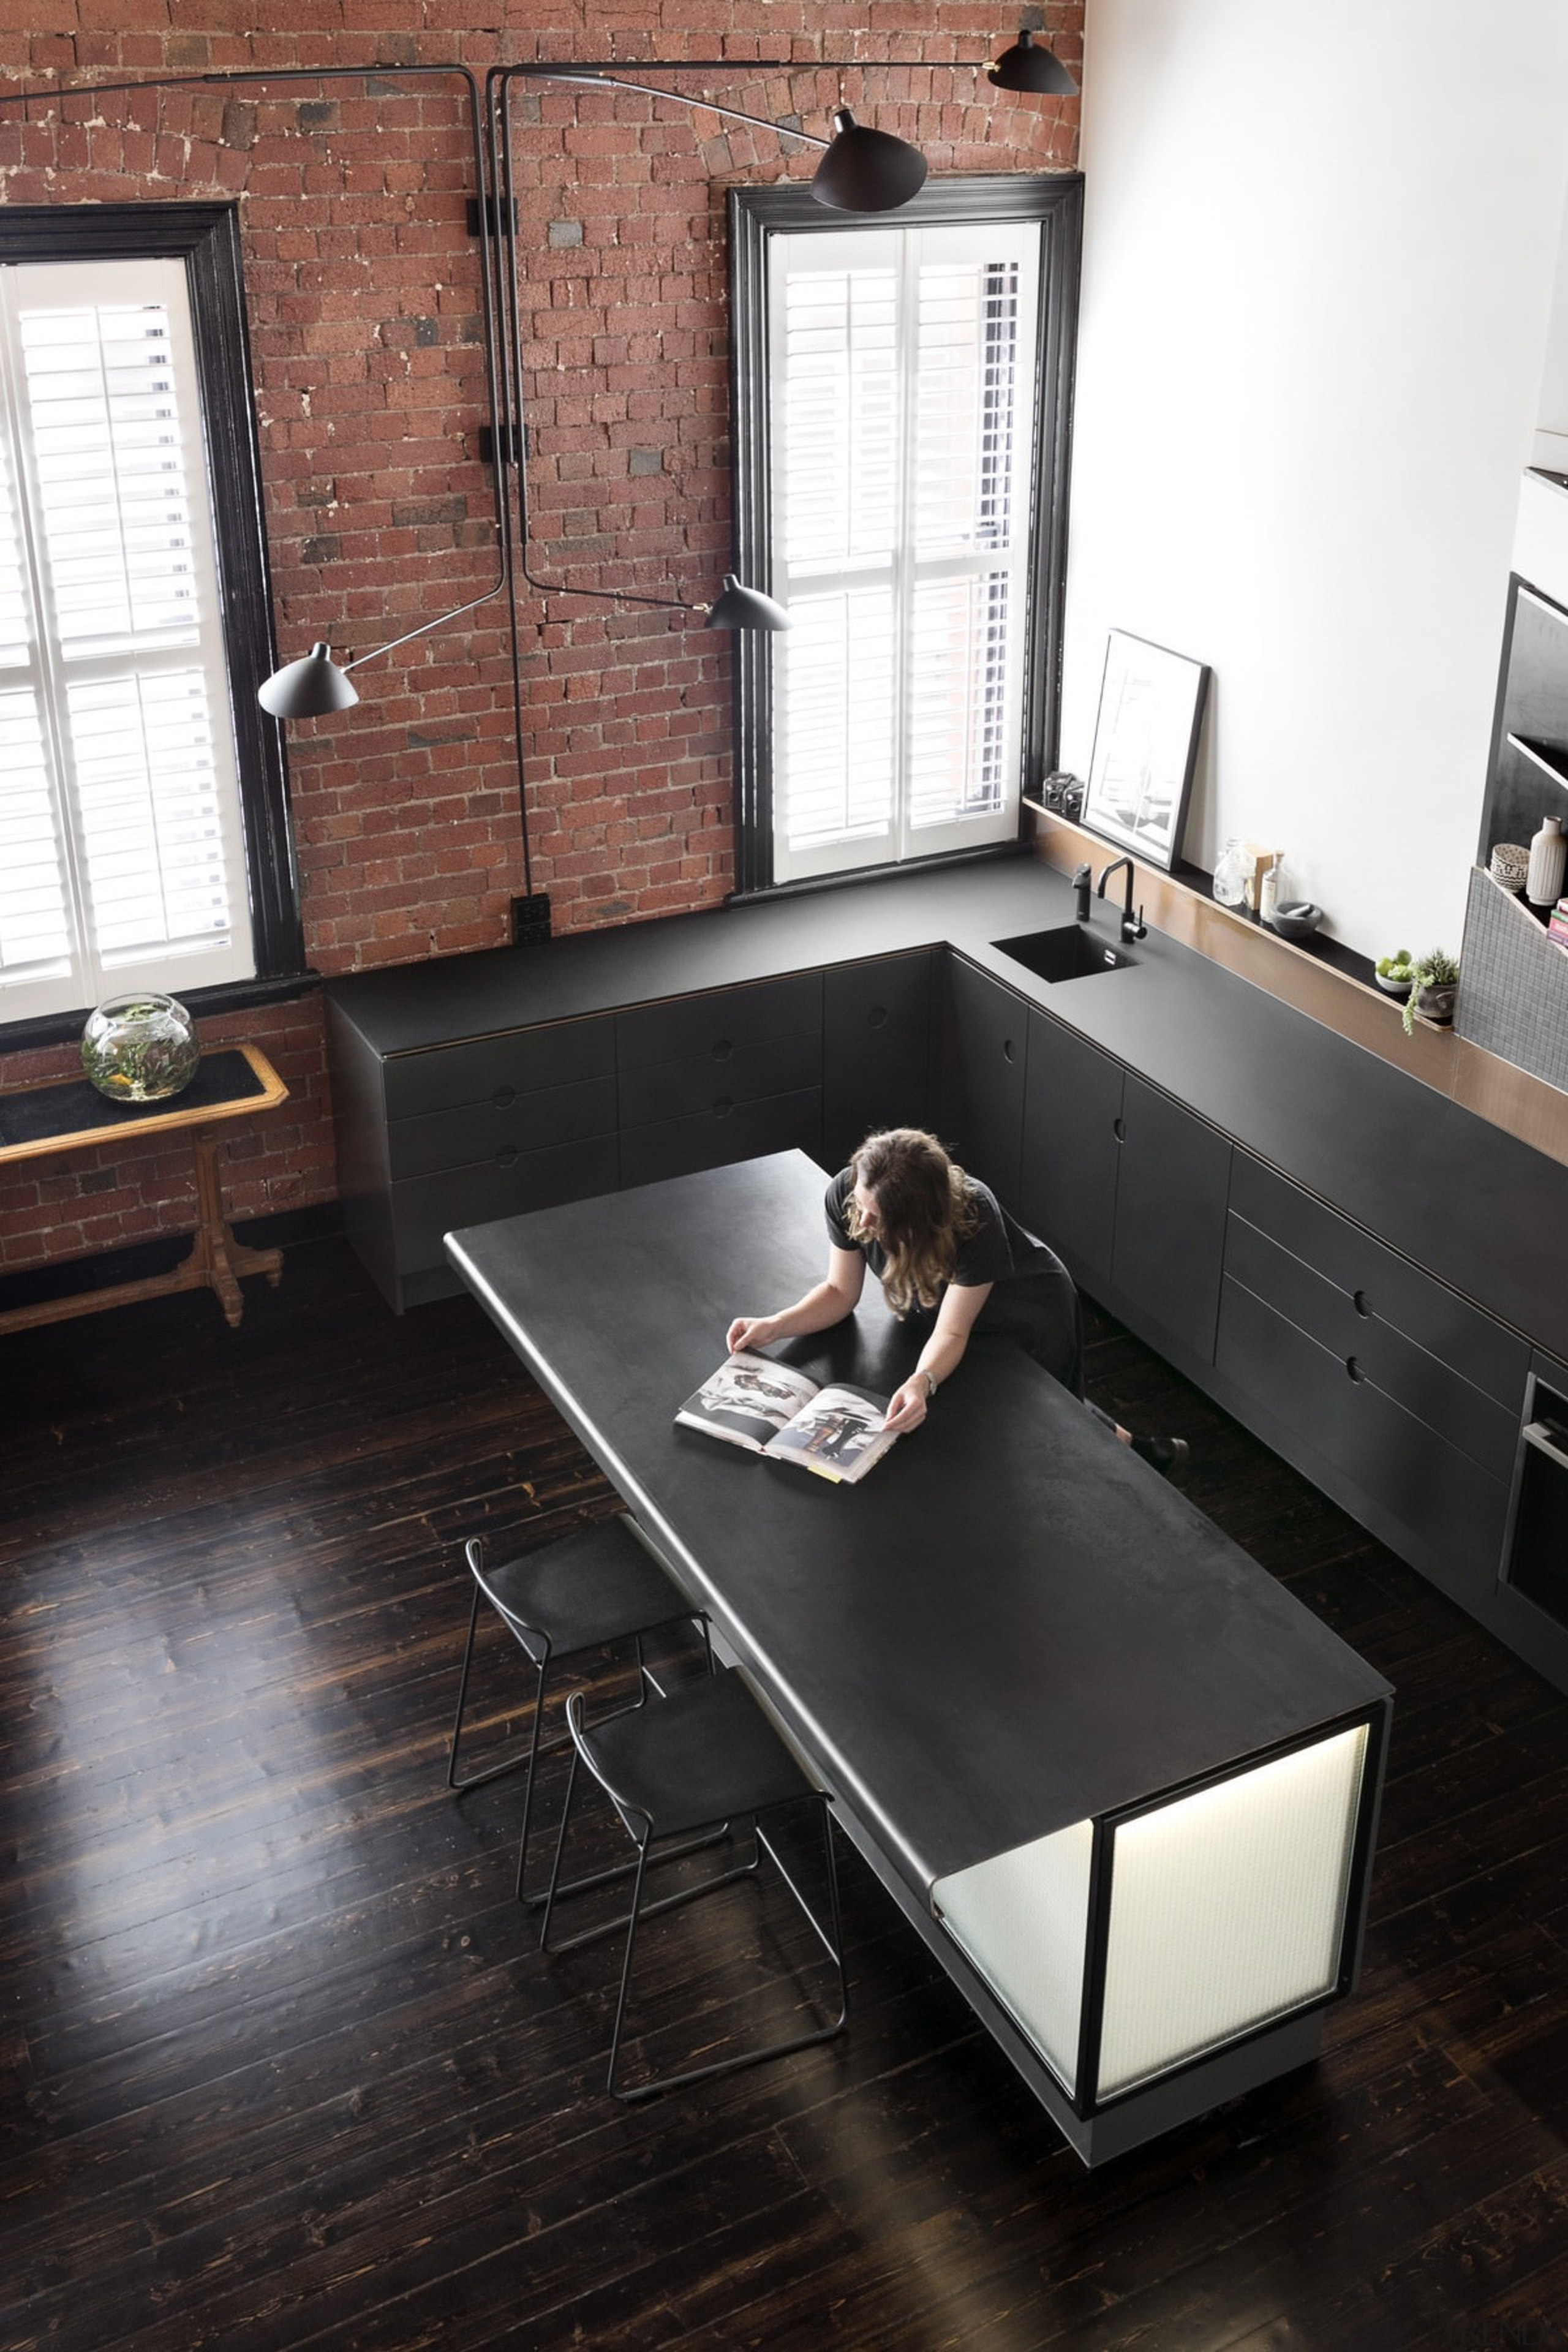 Ample space for entertaining and preparing meals - countertop, desk, floor, flooring, furniture, hardwood, interior design, living room, product design, room, table, wood, black, white